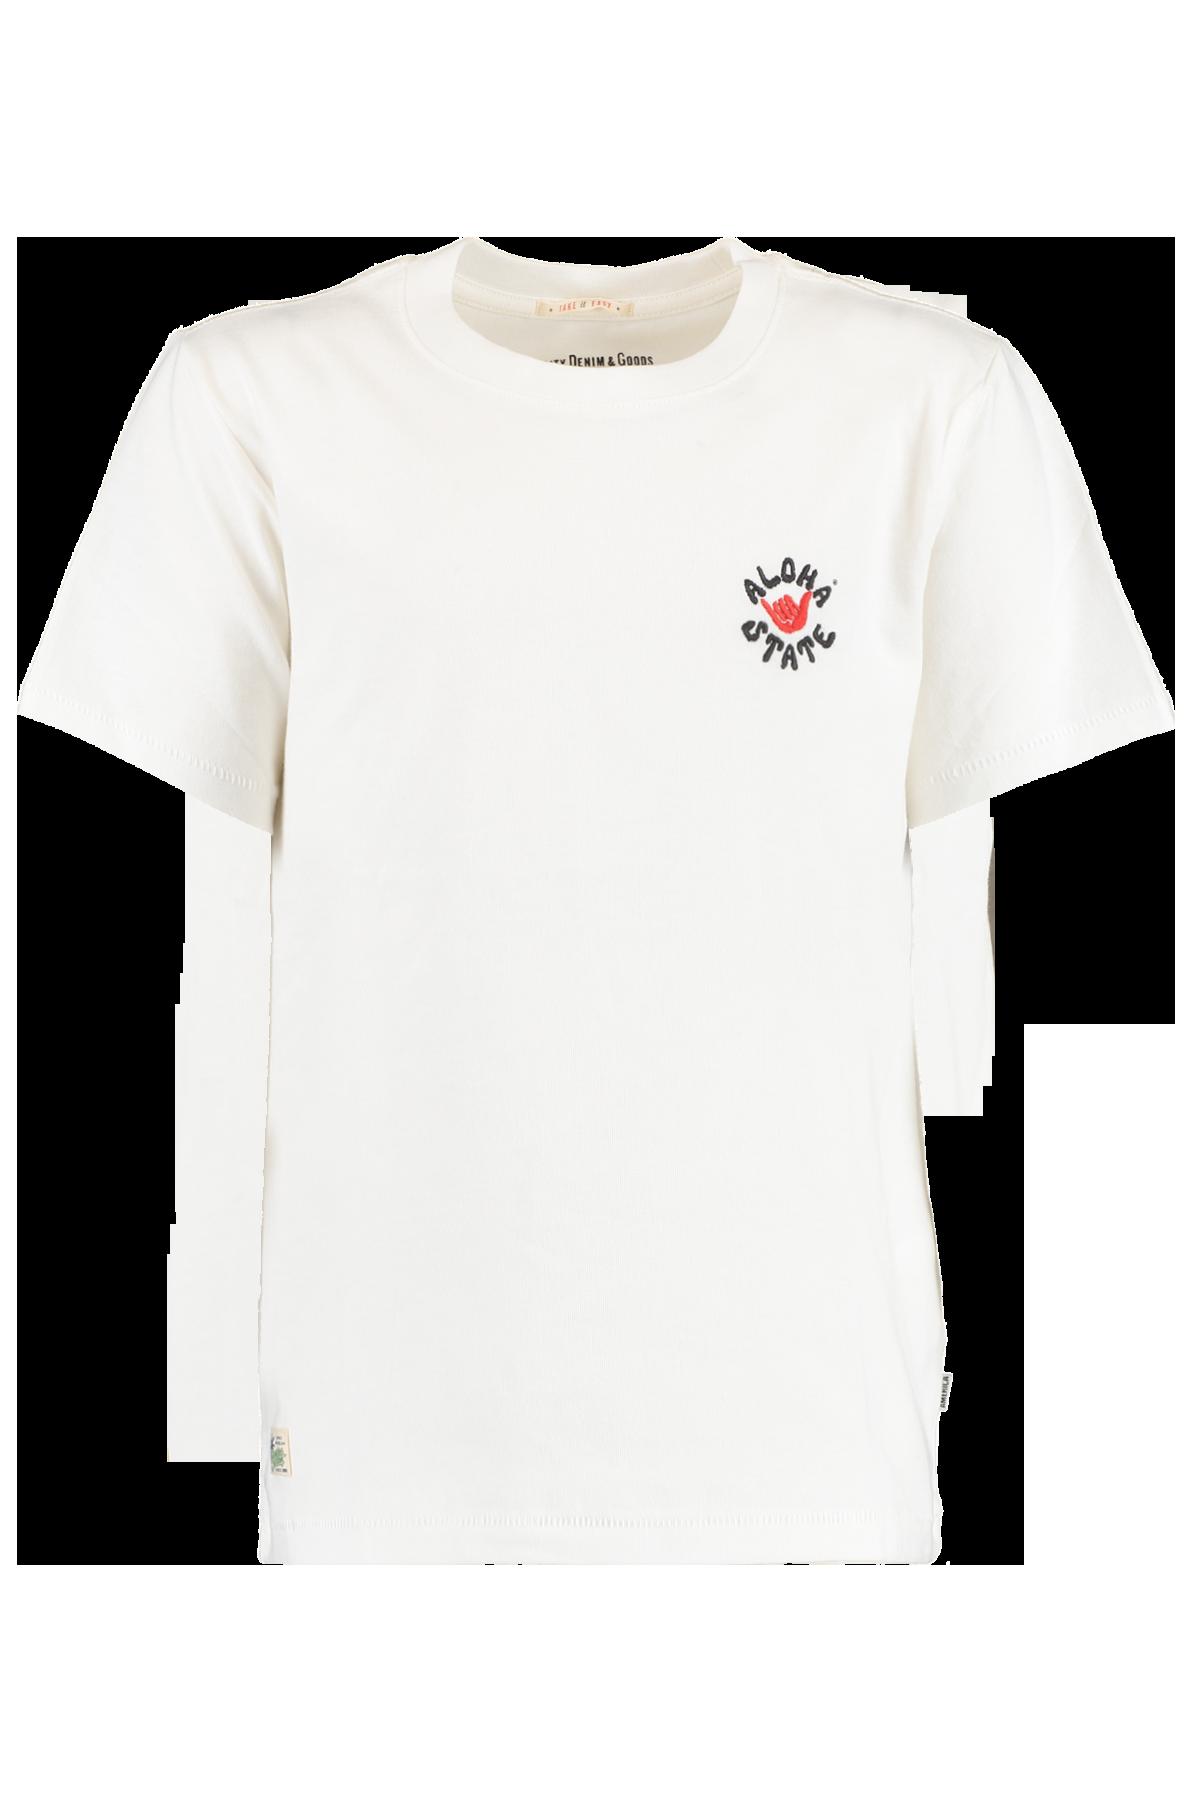 T-shirt Eamon Chest JR